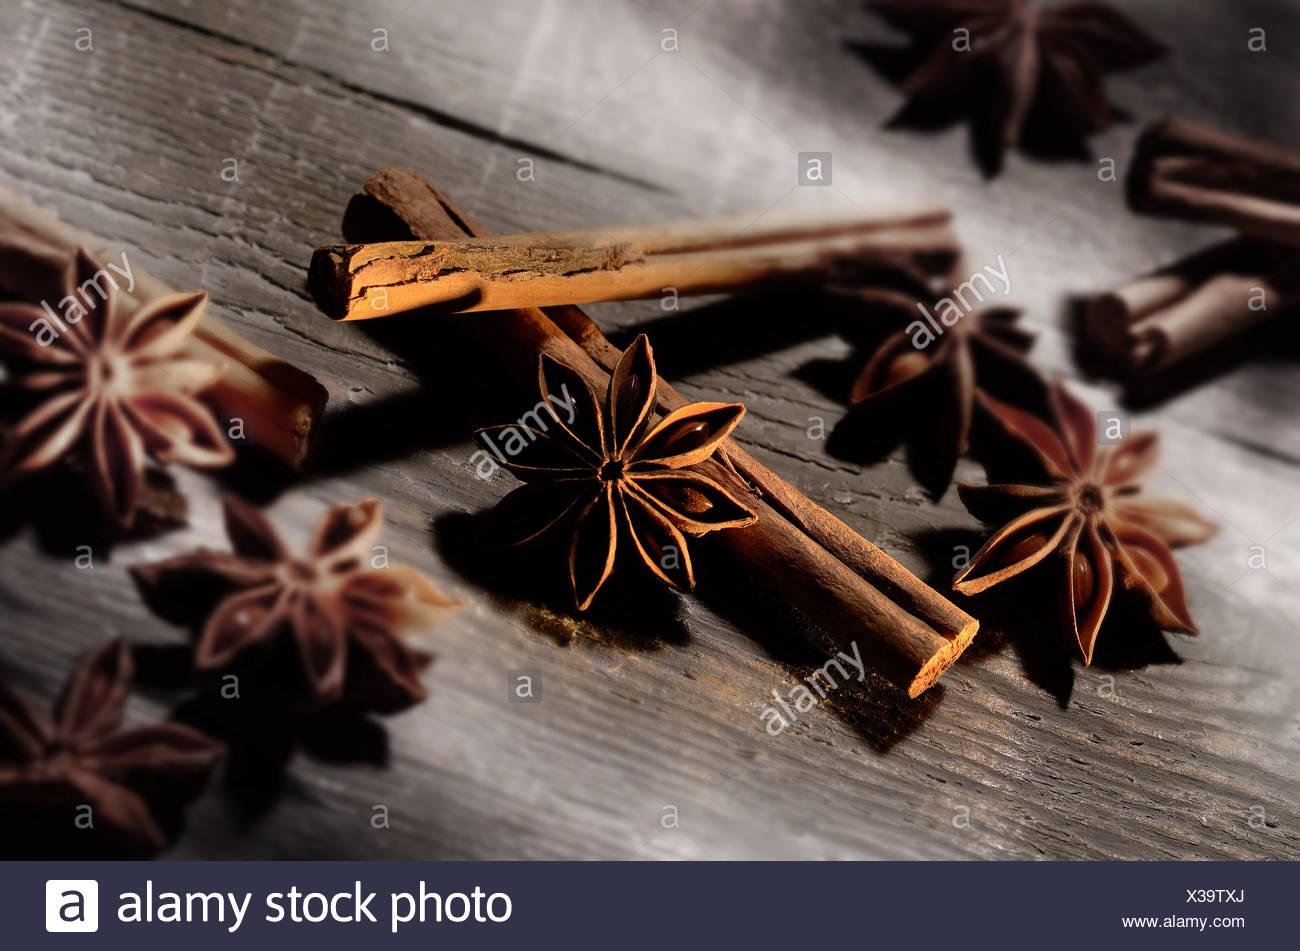 anise and cinnamon - Stock Image